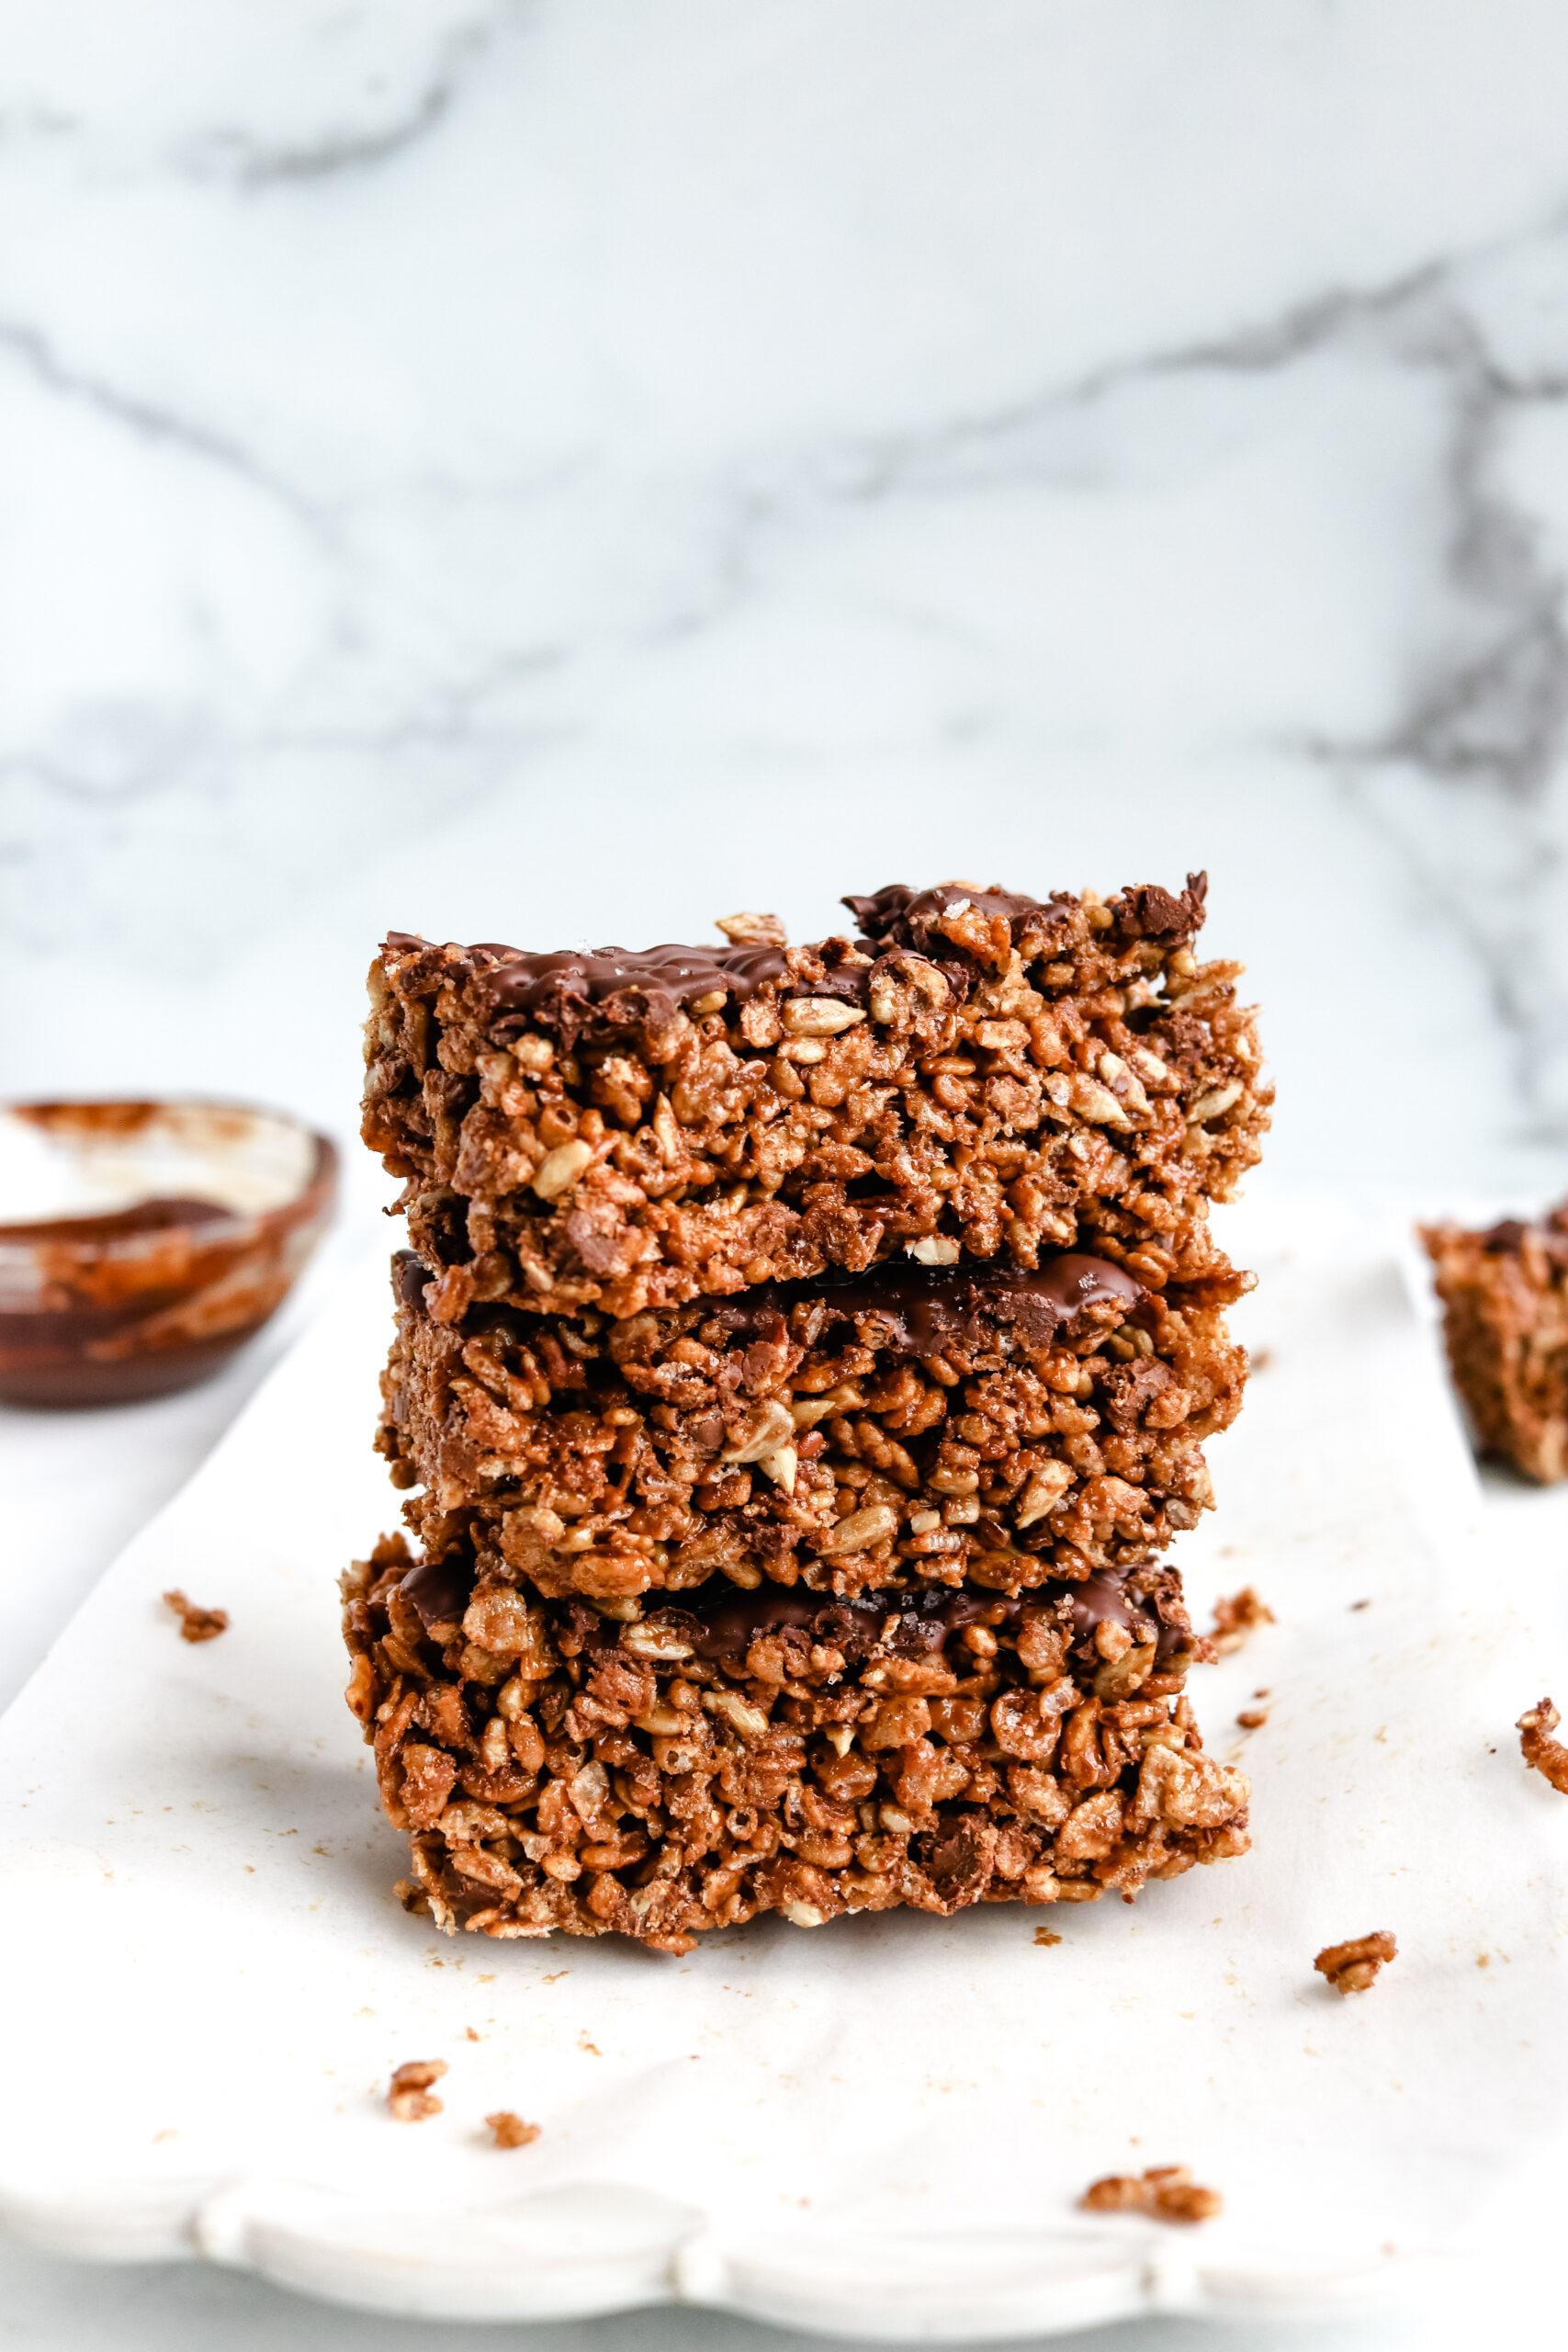 Chocolate Peanut Butter Rice Bars